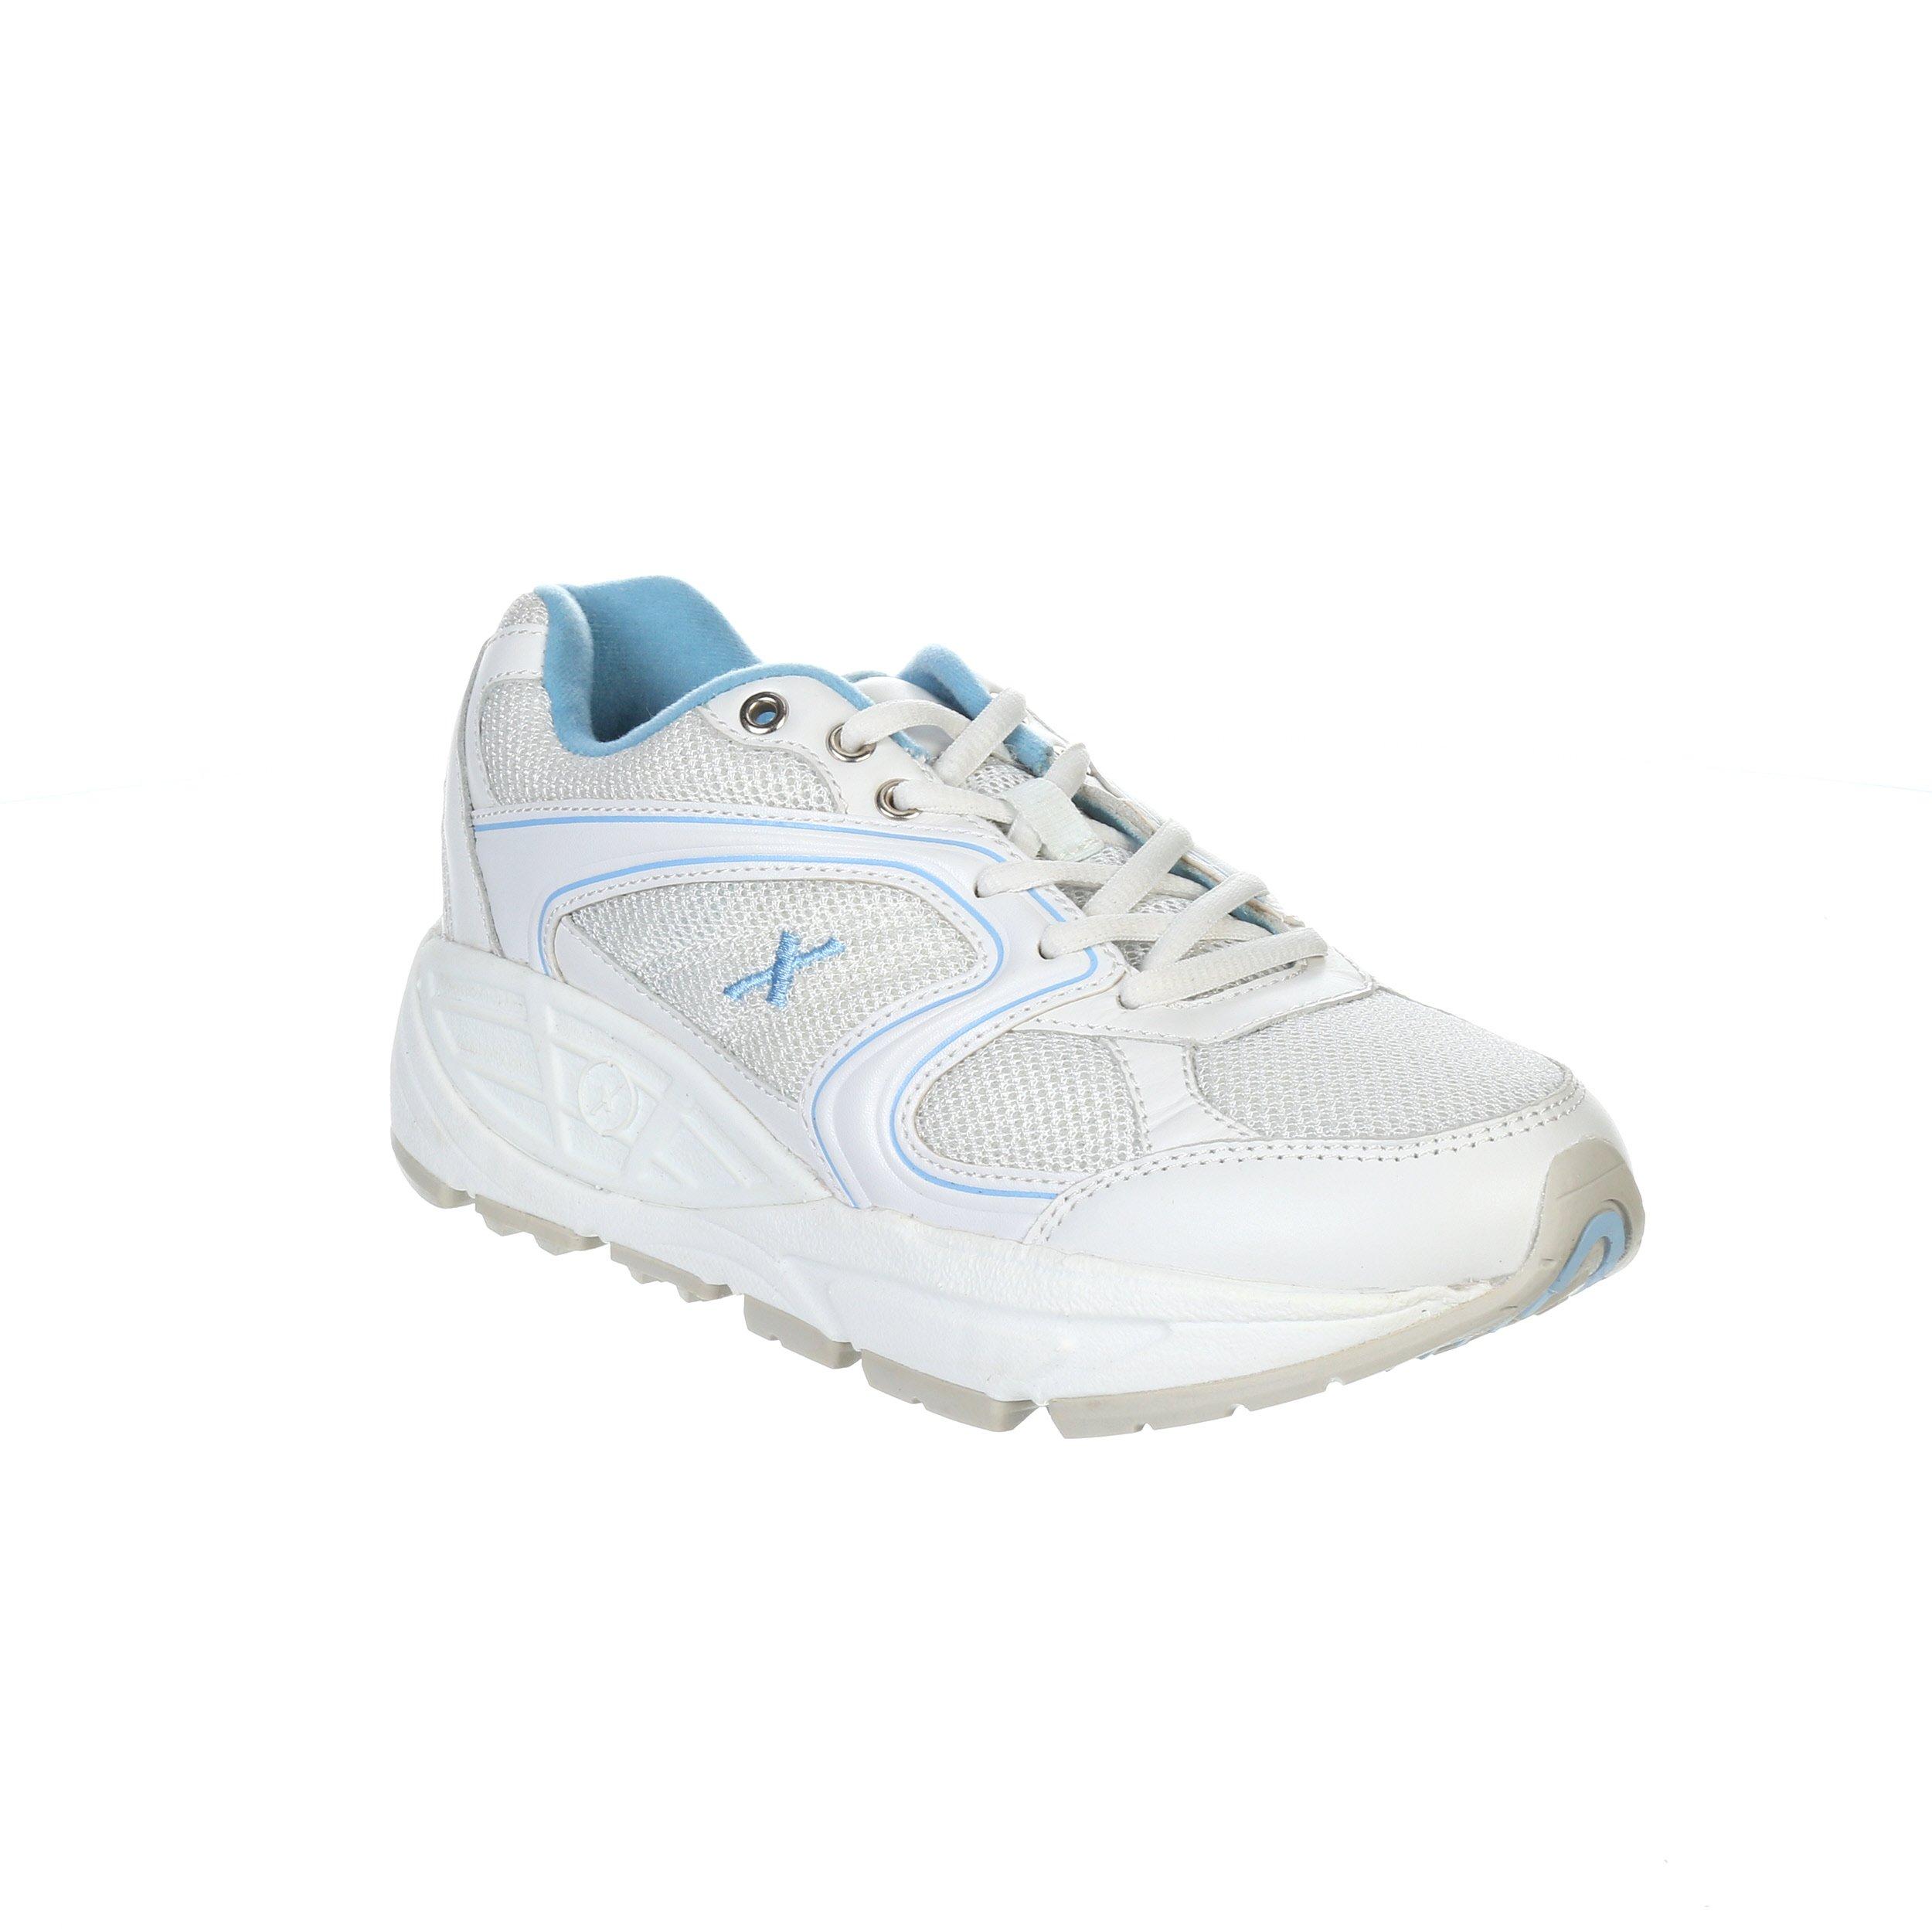 Xelero Matrix II Women's Comfort Therapeutic Extra Depth Sneaker Shoe: White/Blue 8.5 Wide (D) Lace